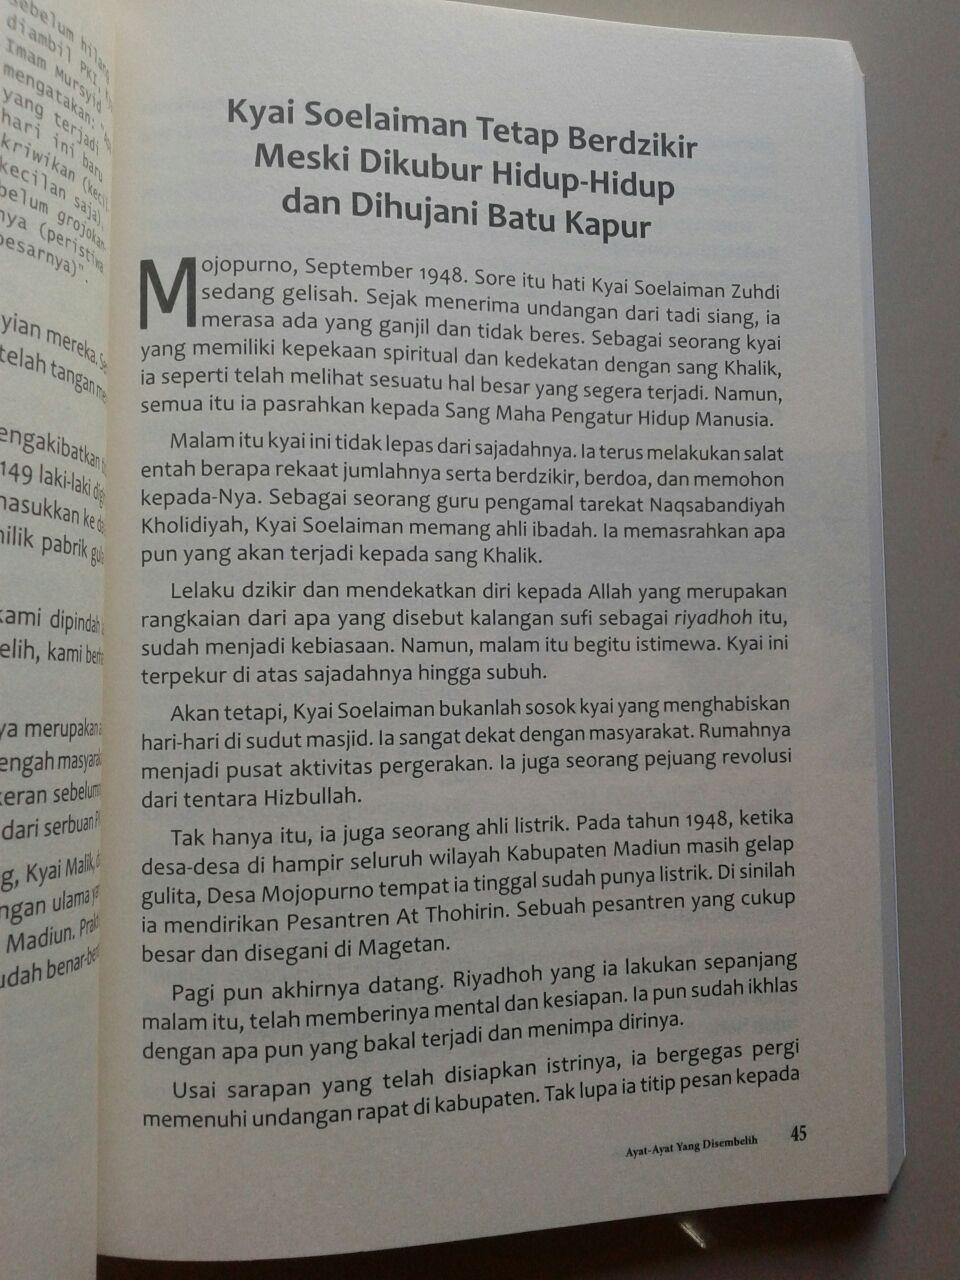 Buku Ayat Ayat Allah Yang Disembelih Sejarah Banjir Darah Para Kyai isi 2